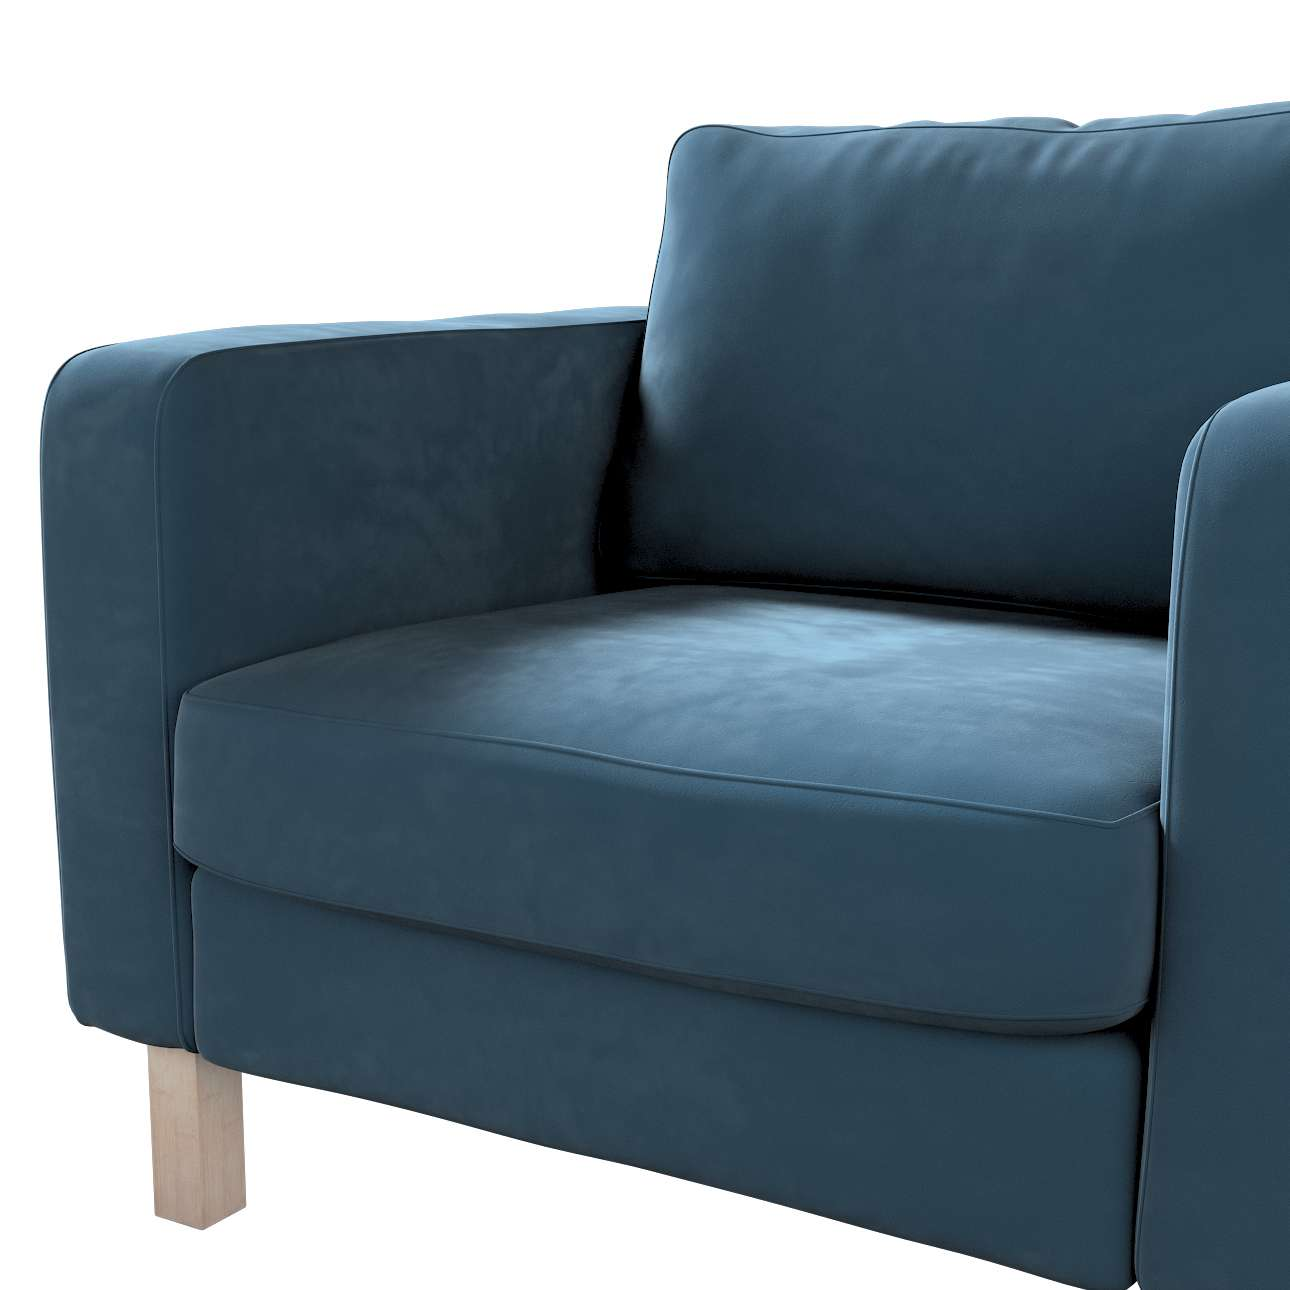 Pokrowiec na fotel Karlstad, krótki w kolekcji Velvet, tkanina: 704-16